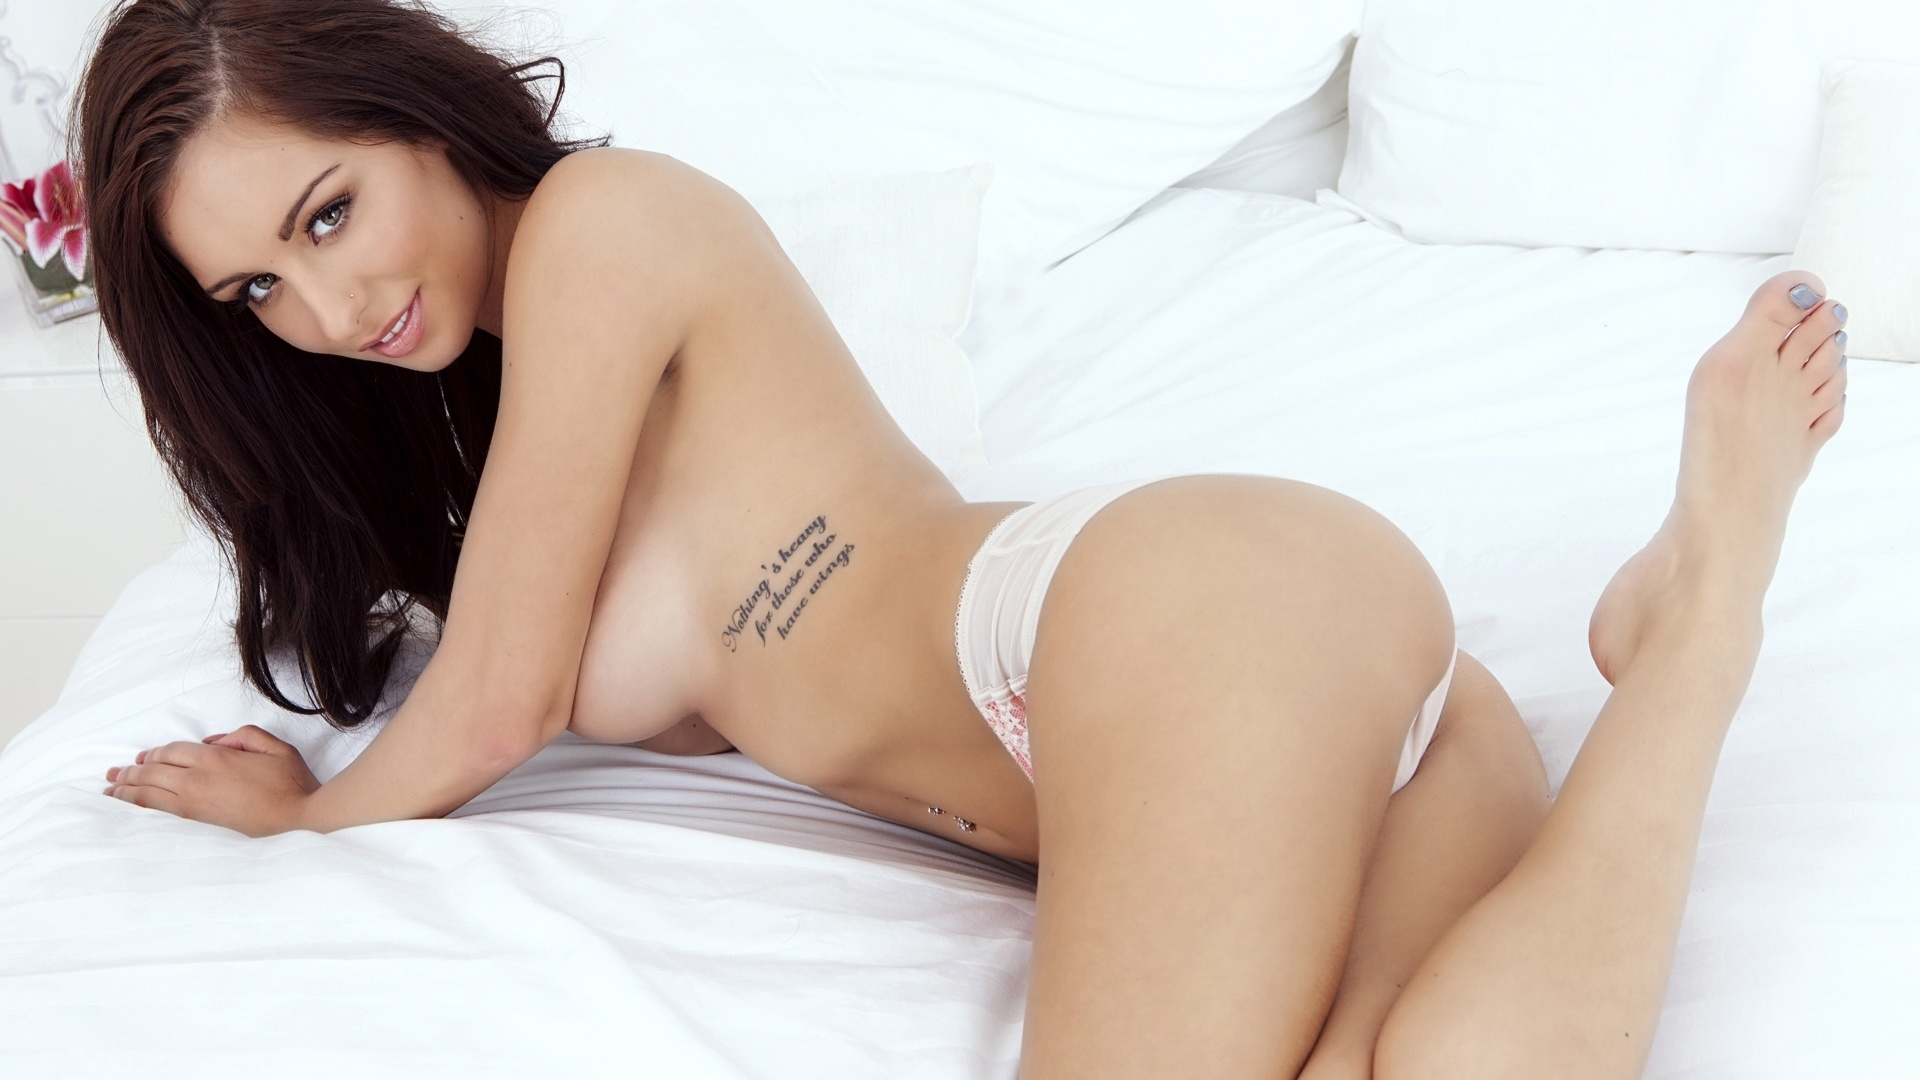 Playboy Paige Phillips Playmate Lingerie Brute Wallpaper